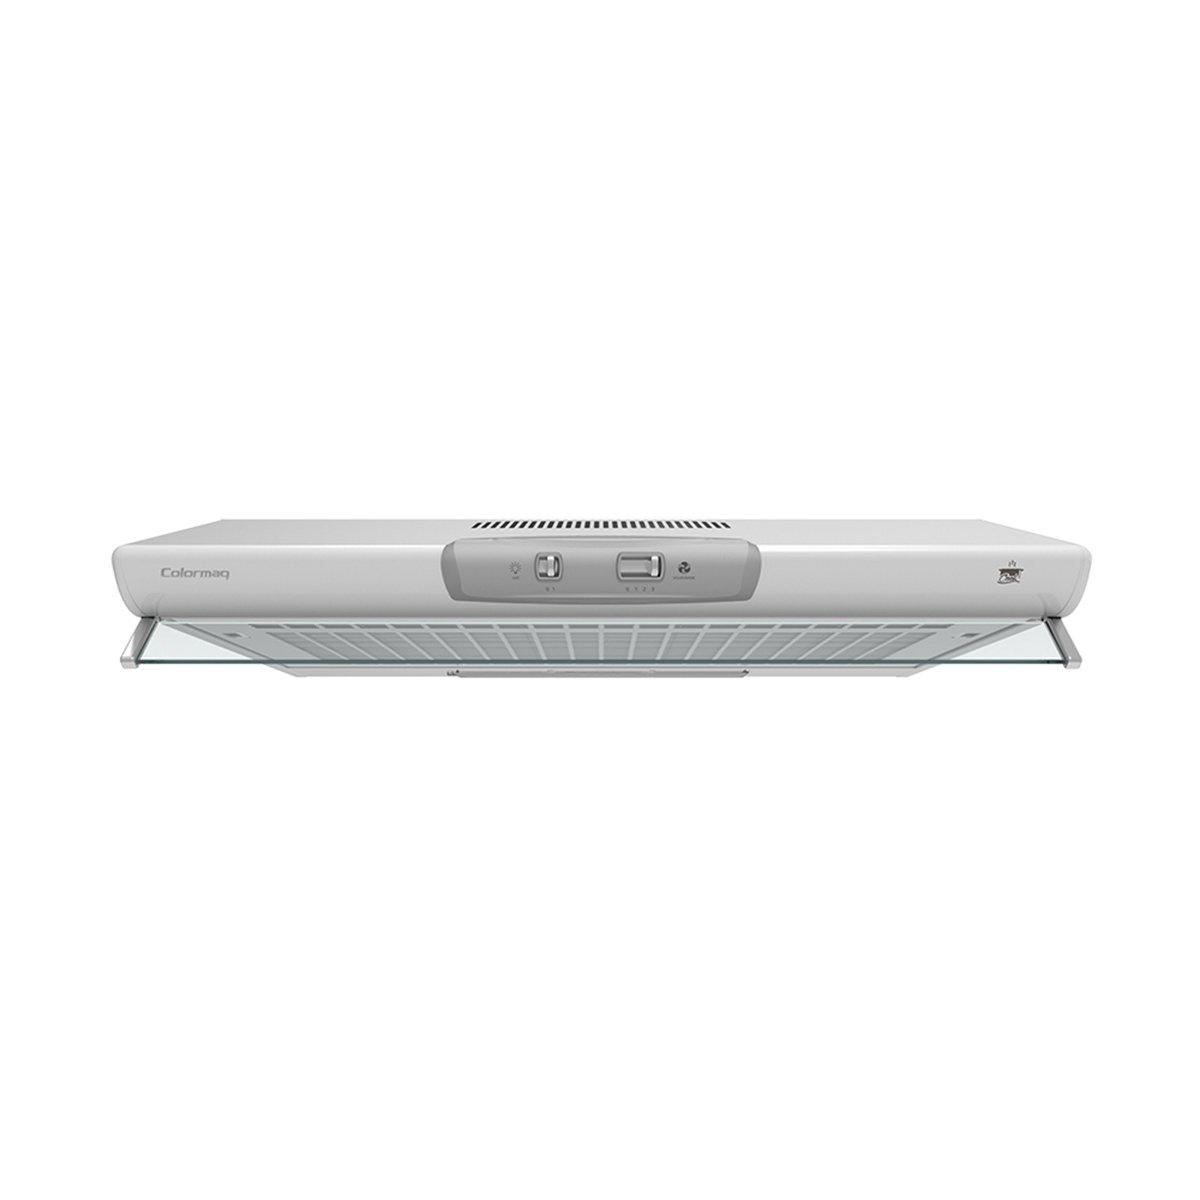 Depurador de Ar Colormaq Cook 80cm Branco 220V